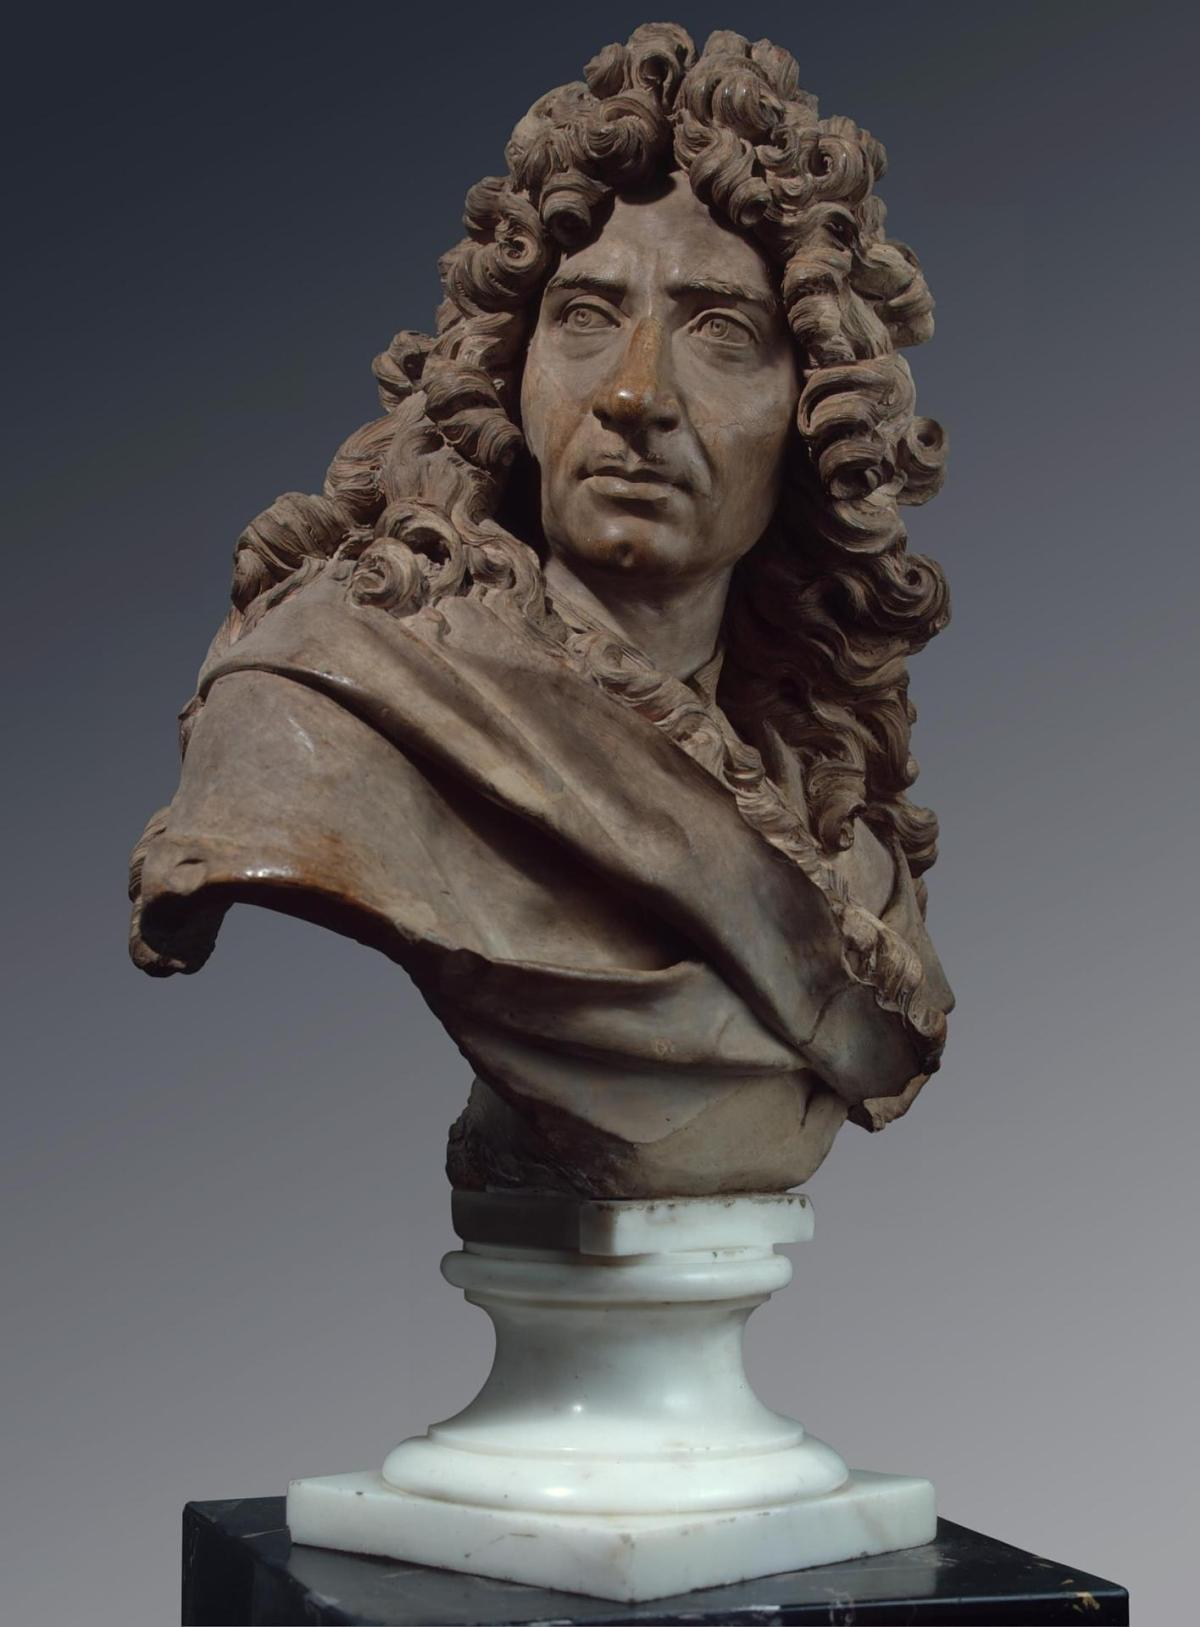 Portrait of Mignard by Antoine Coysevox